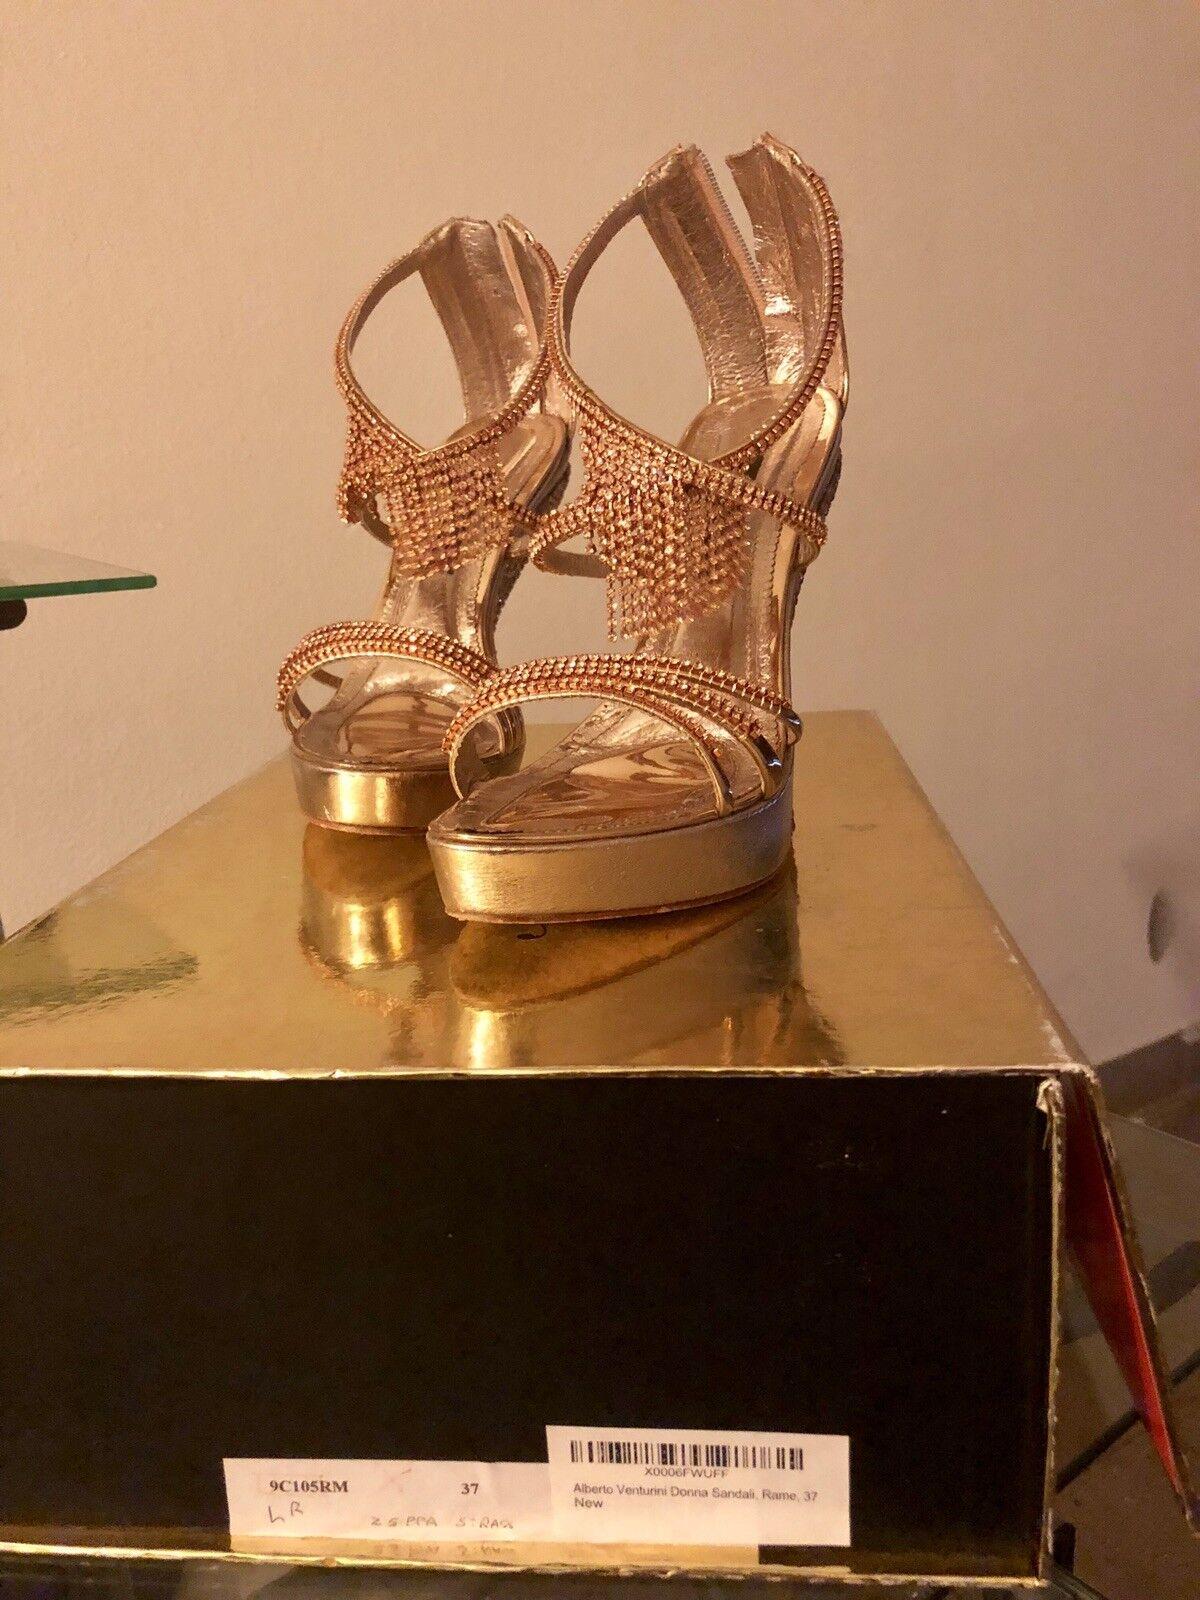 Sandalo Alberto Venturini Donna Cerimonia Sera Sandali Eleganti Donna